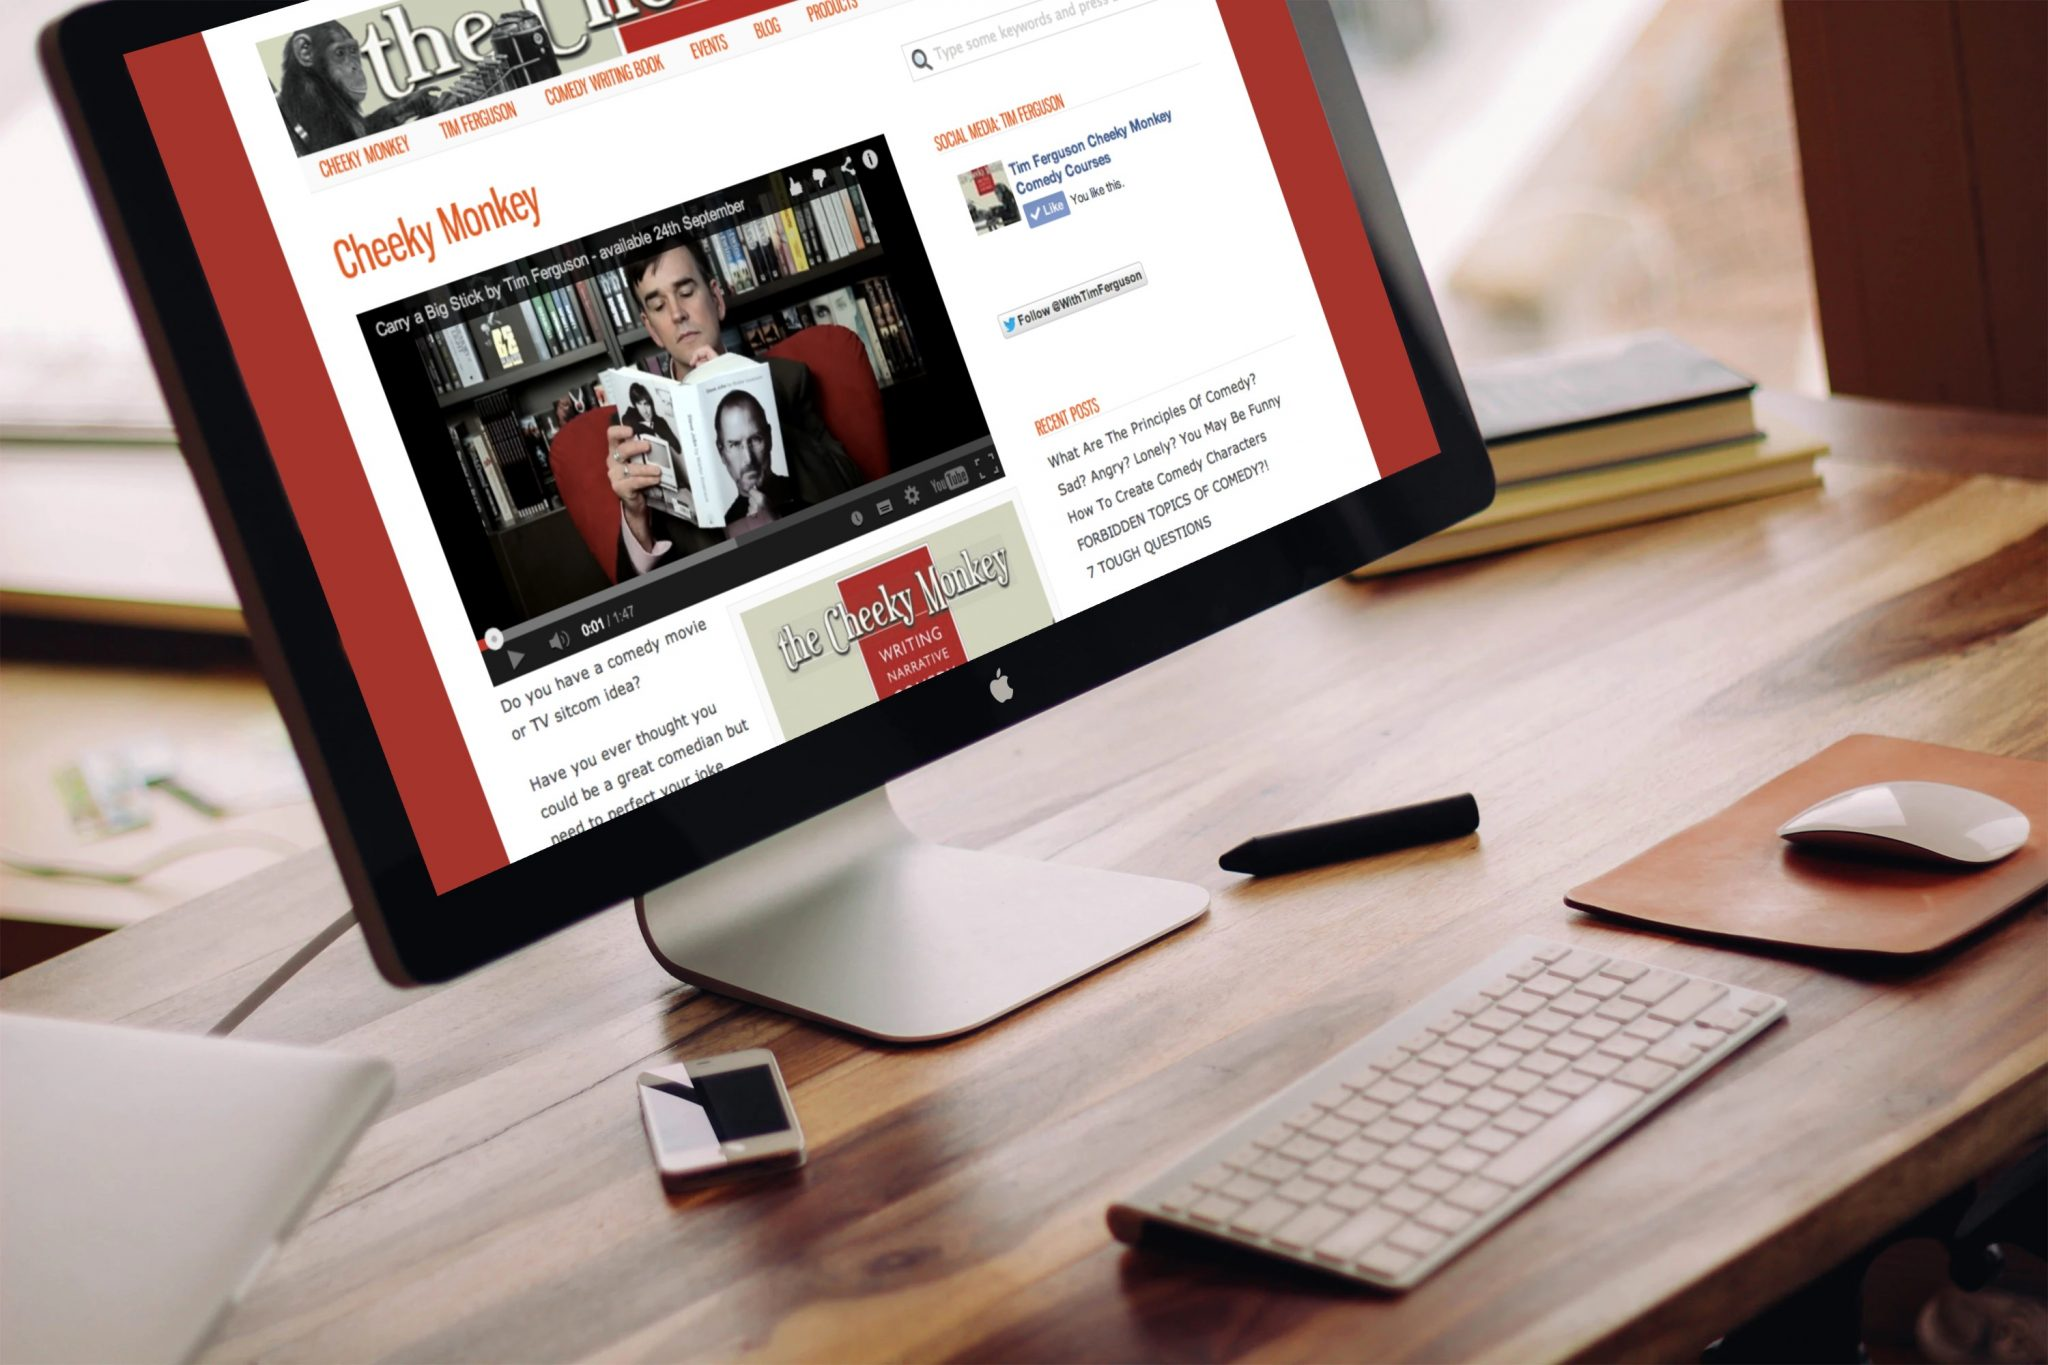 Melbourne website design digital marketing consultant